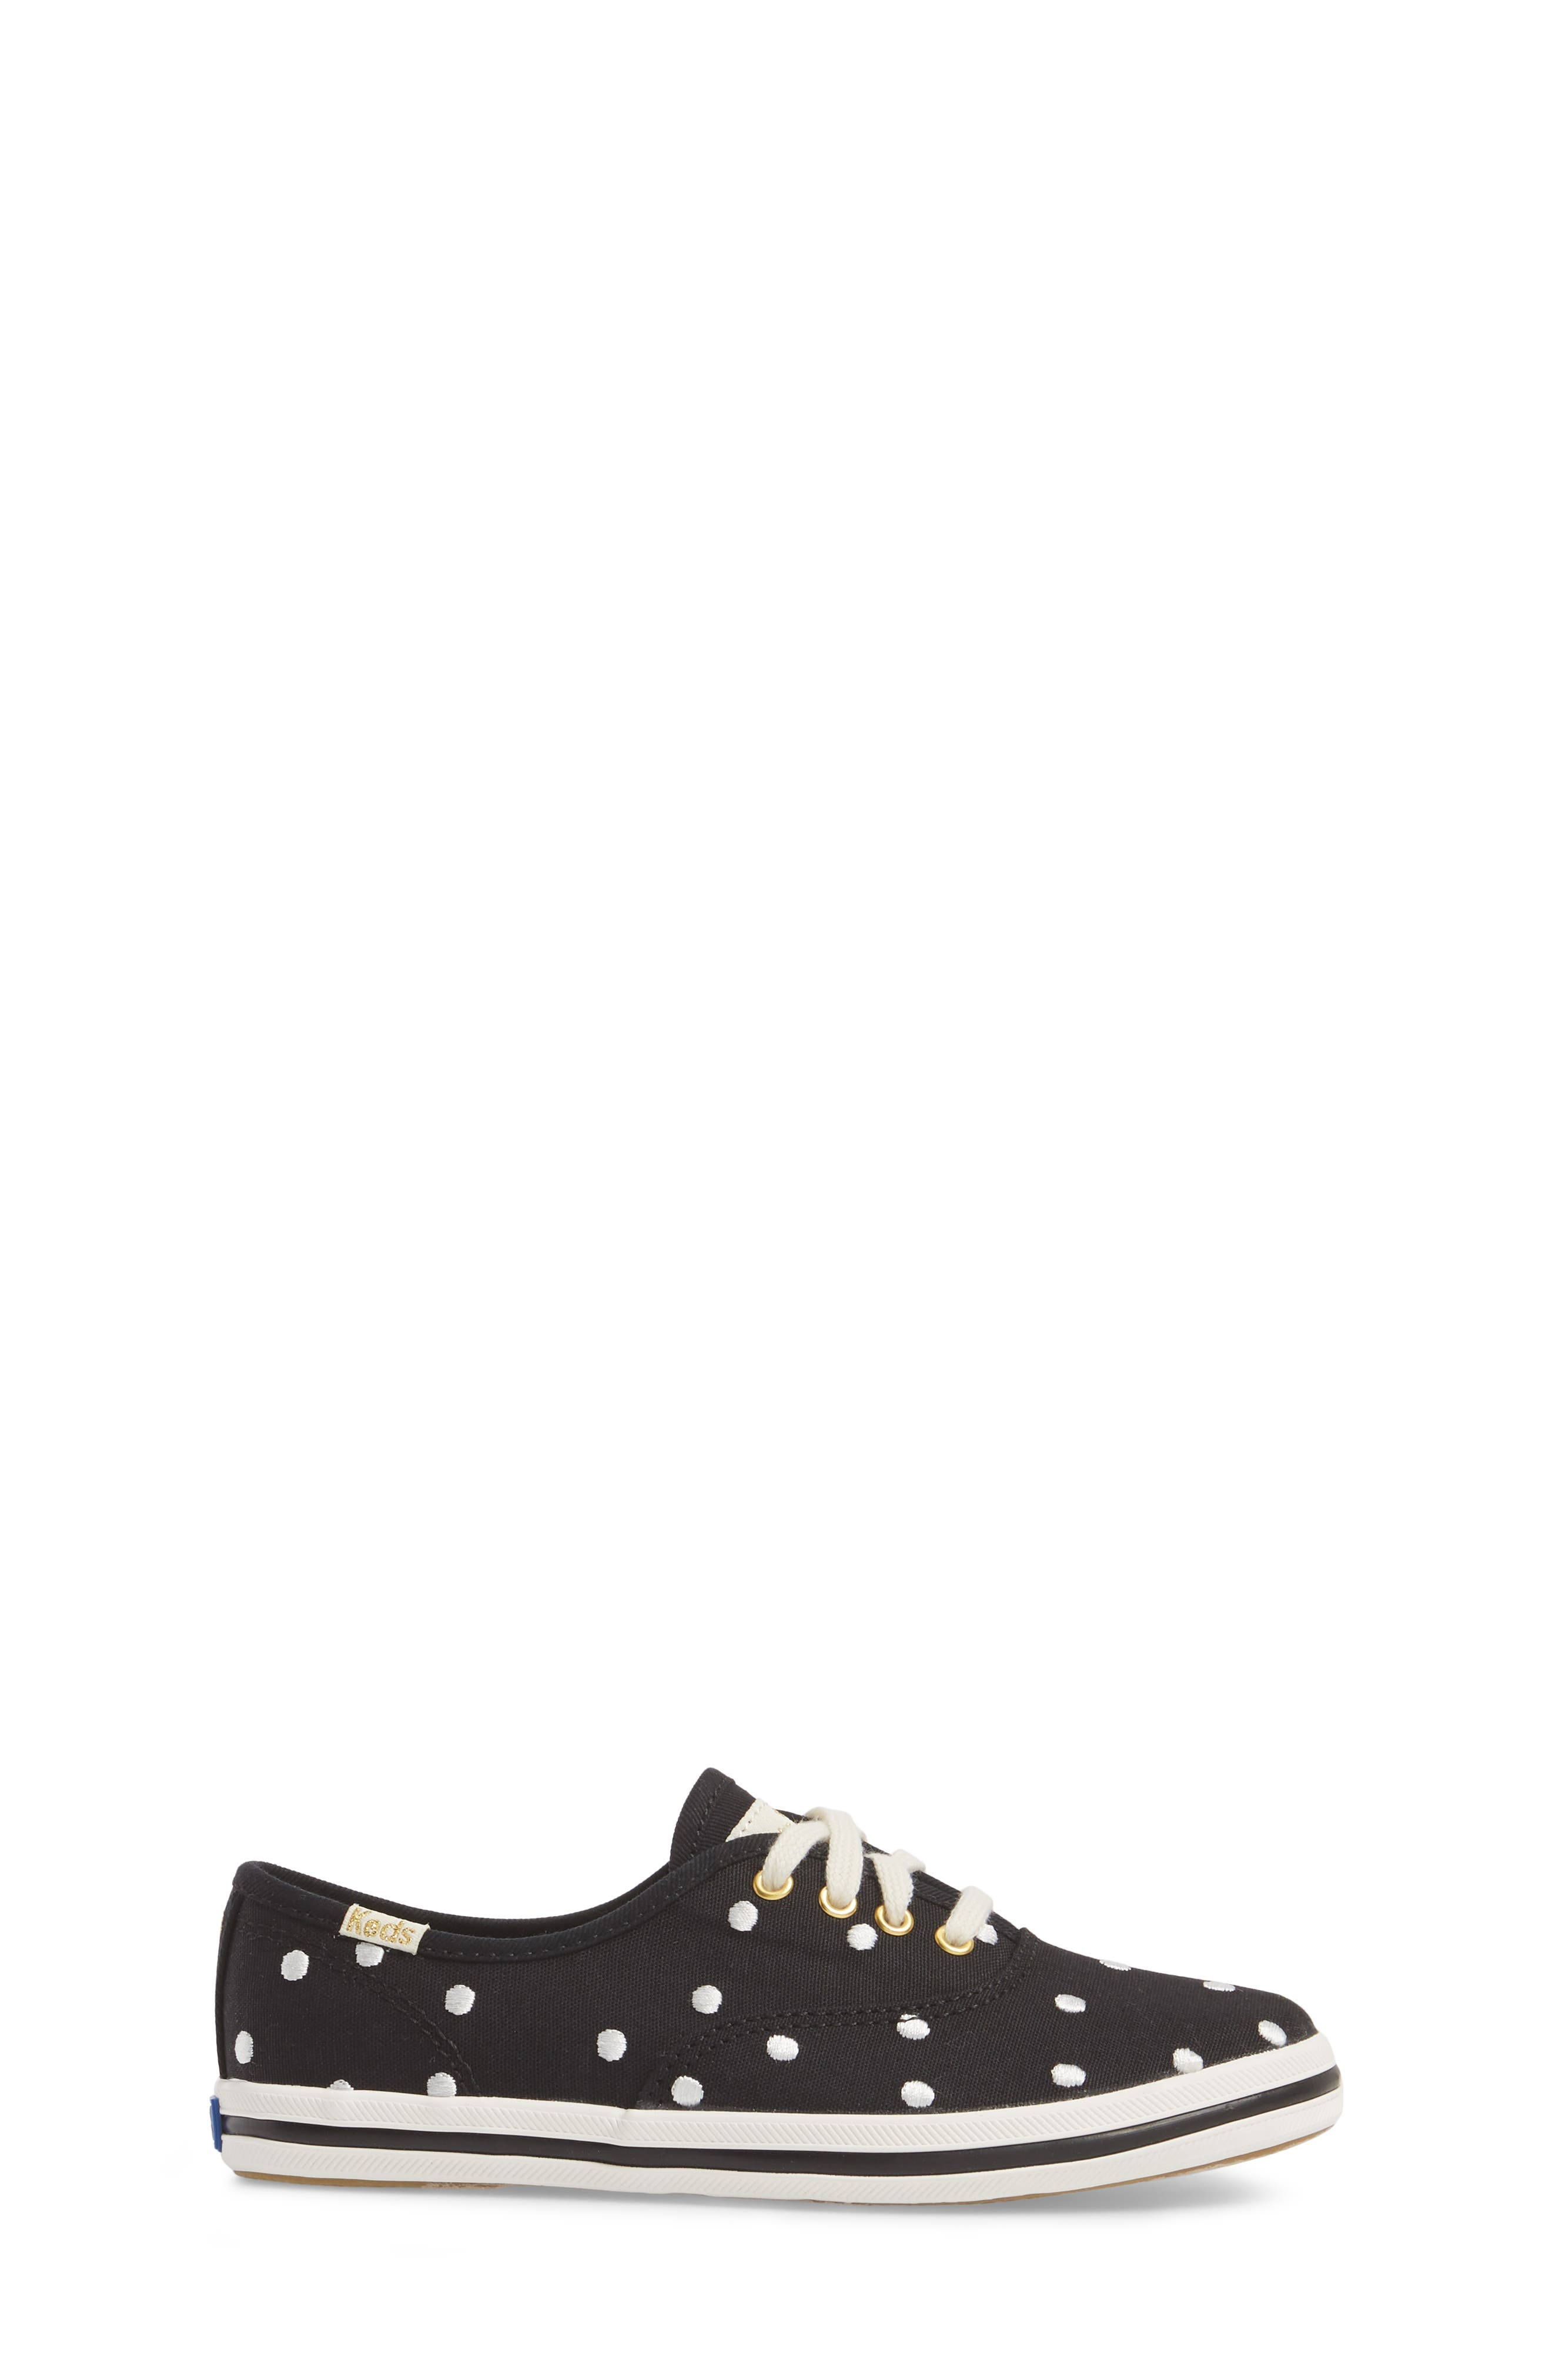 x kate spade new york champion polka dot lace-up shoe,                             Alternate thumbnail 3, color,                             BLACK DANCING DOT